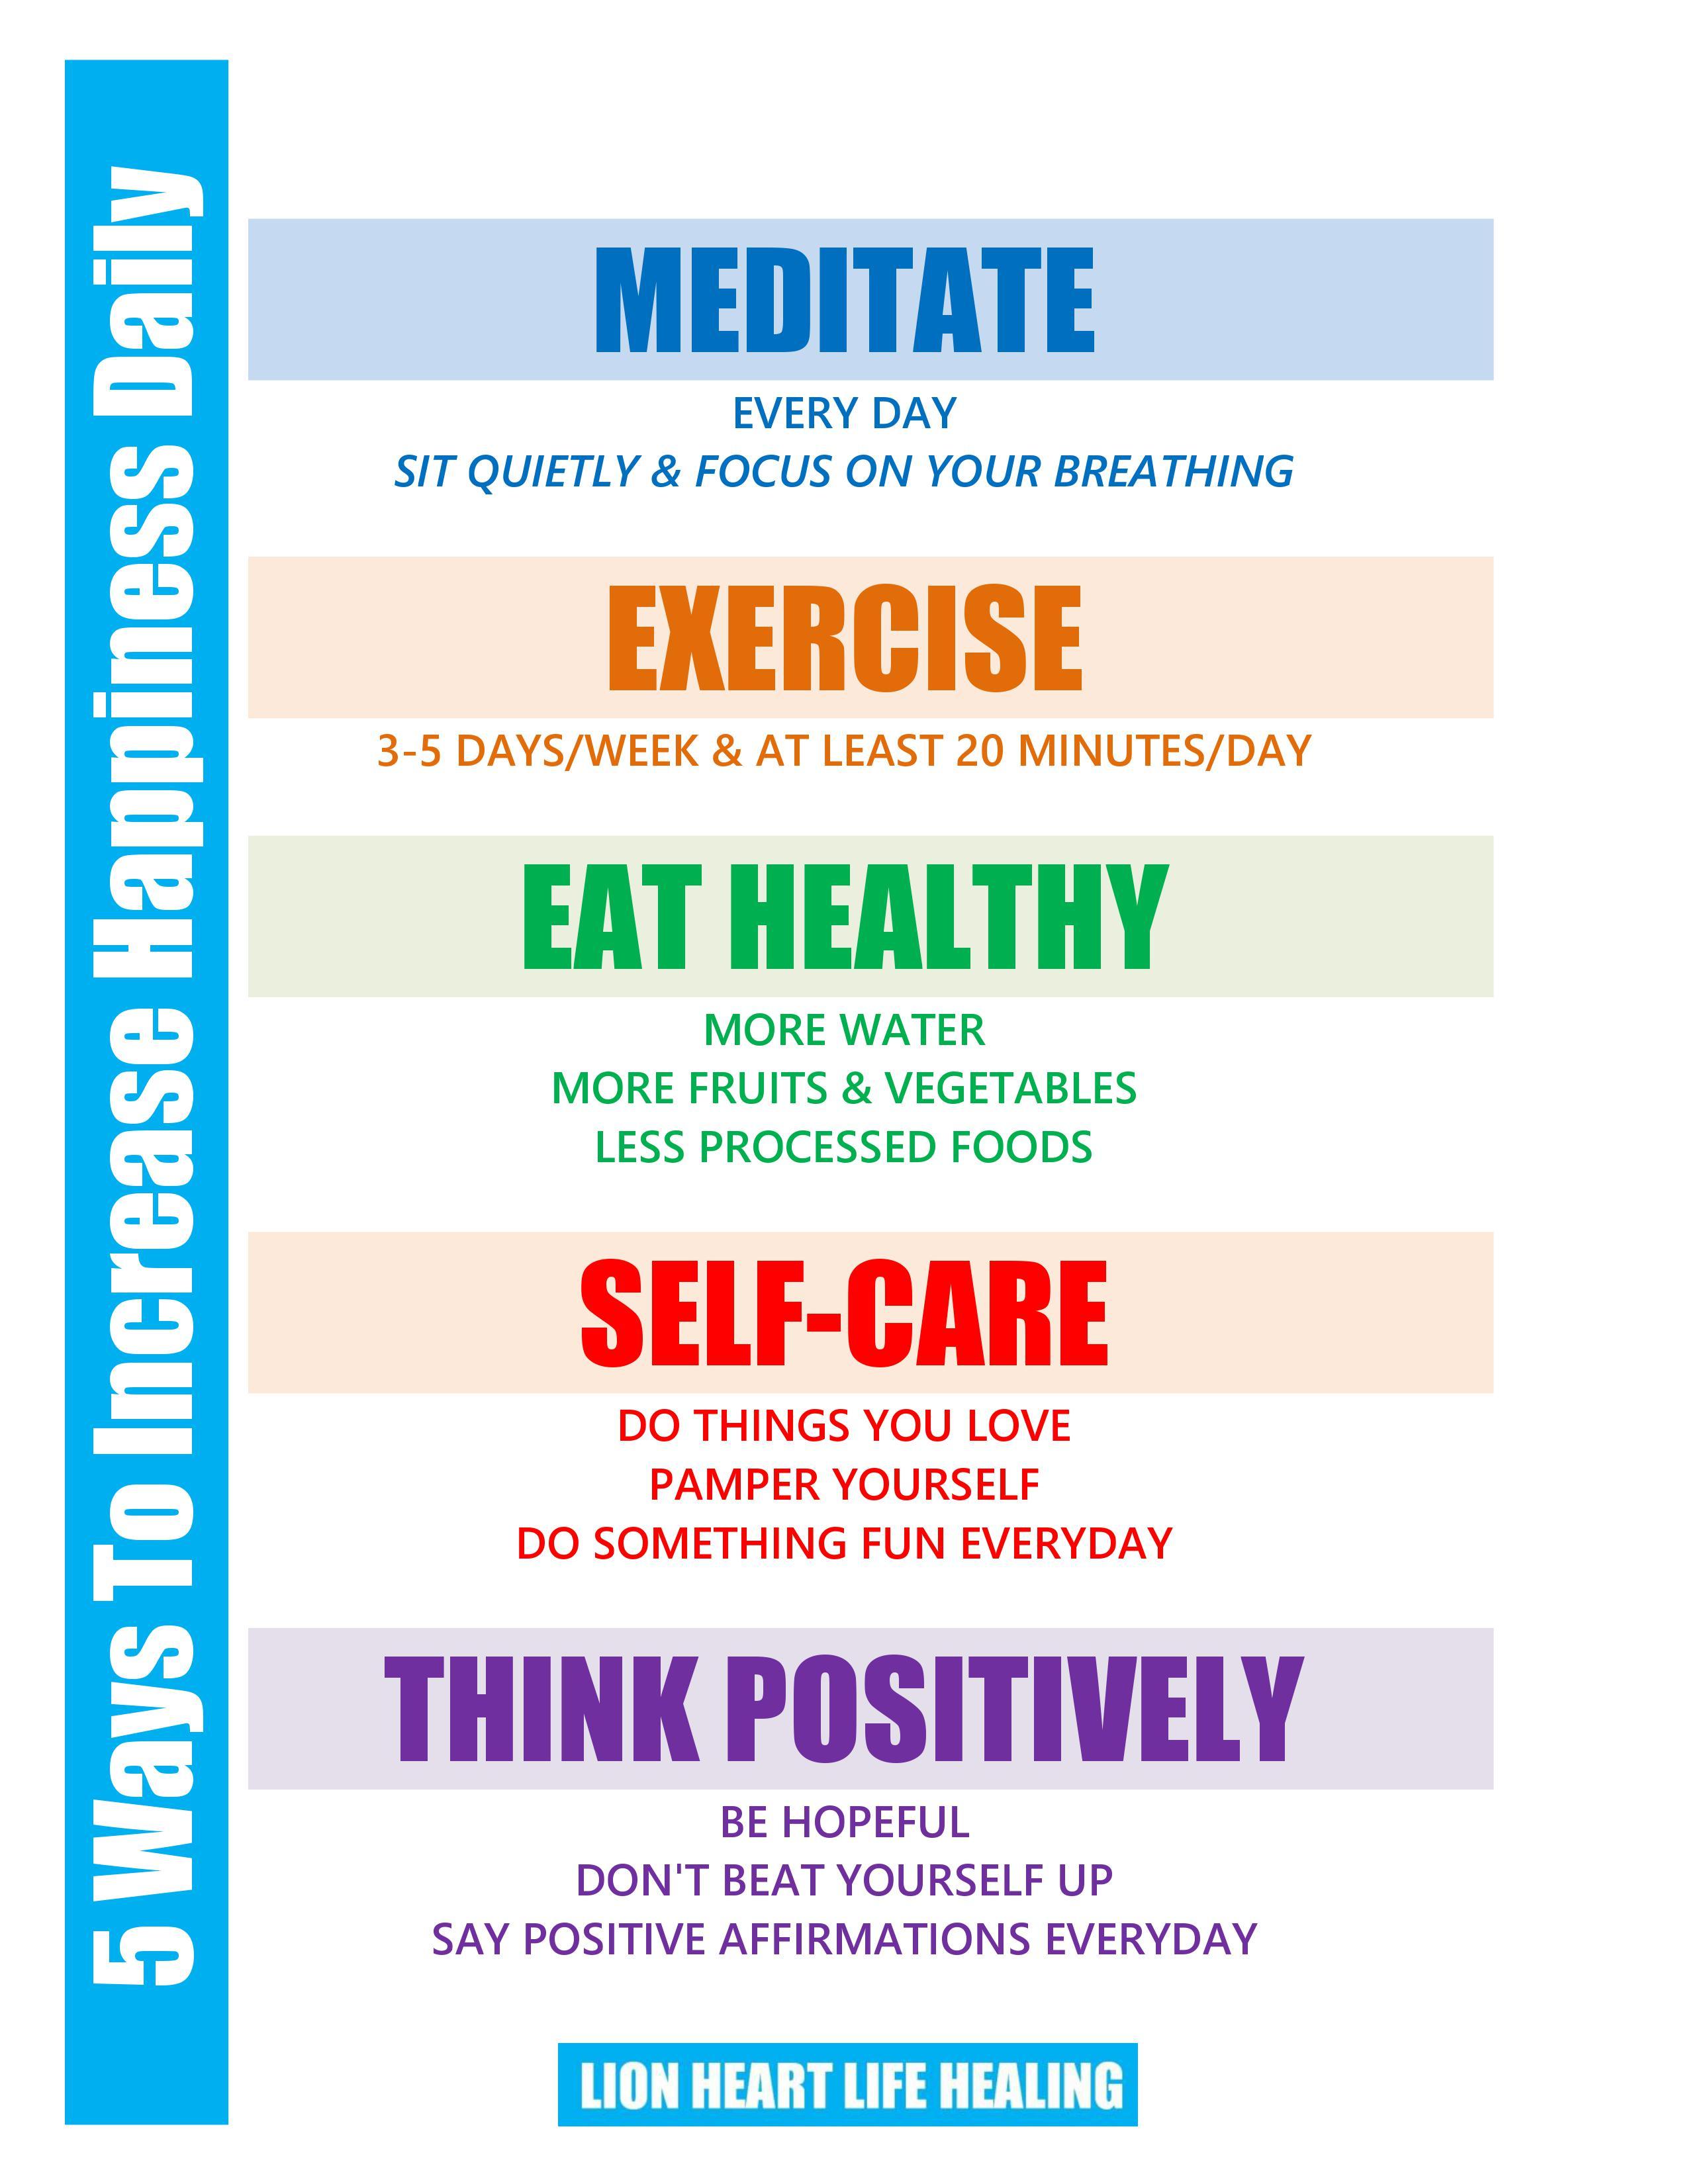 Life Healing Worksheets Amp Handouts Lion Heart Life Healing